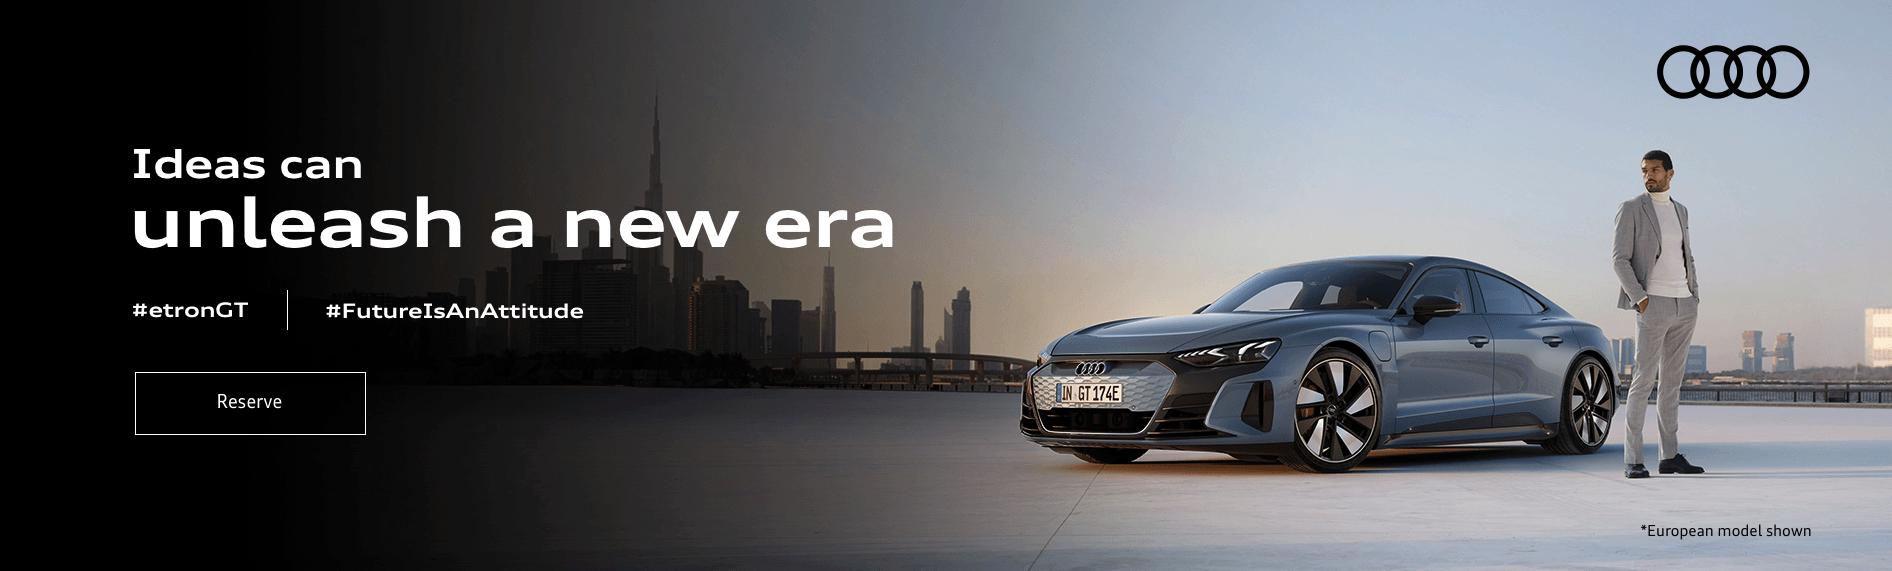 Audi etron GT Promotional Banner